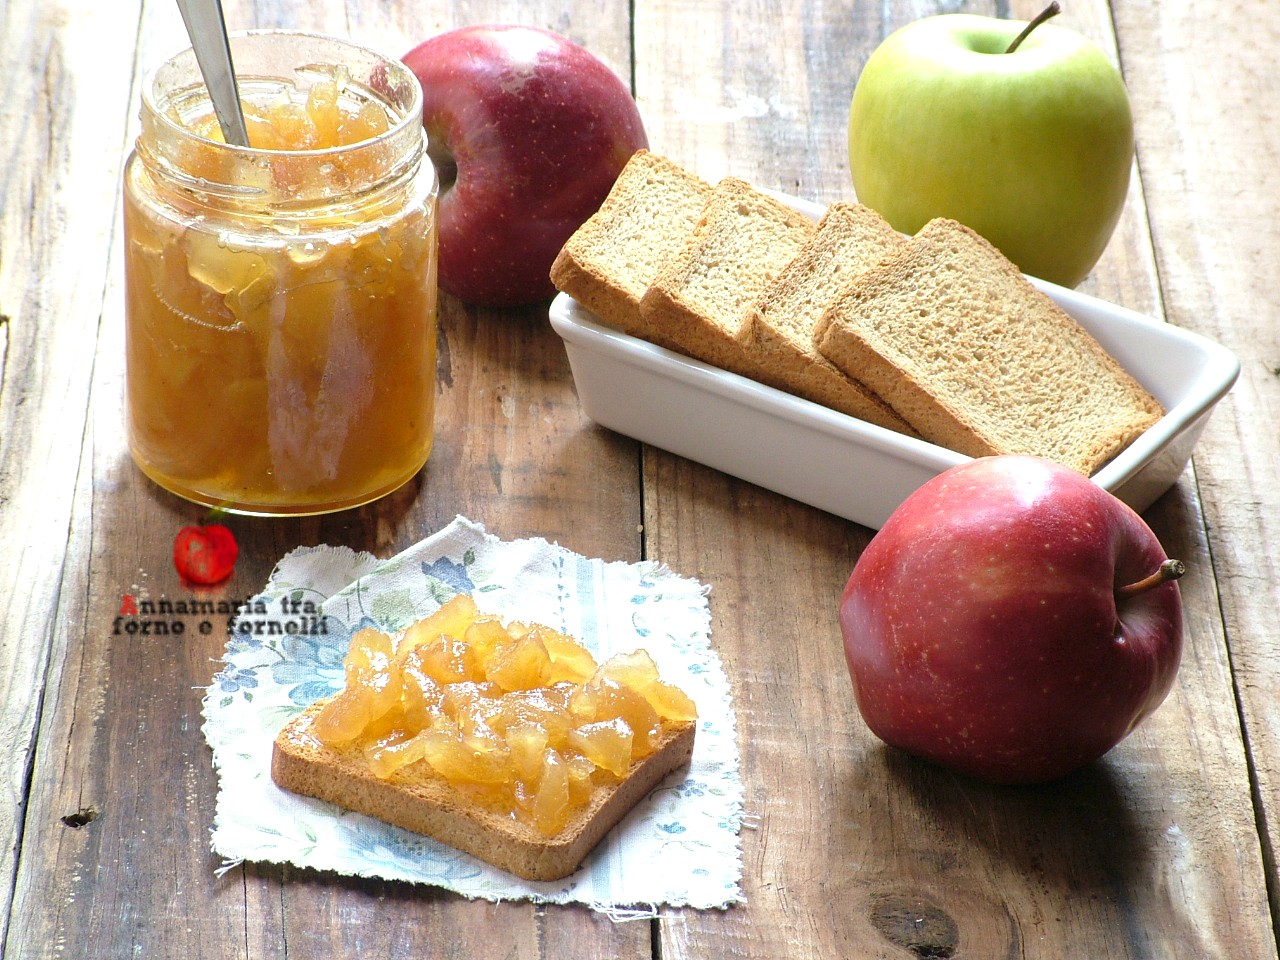 conf di mele